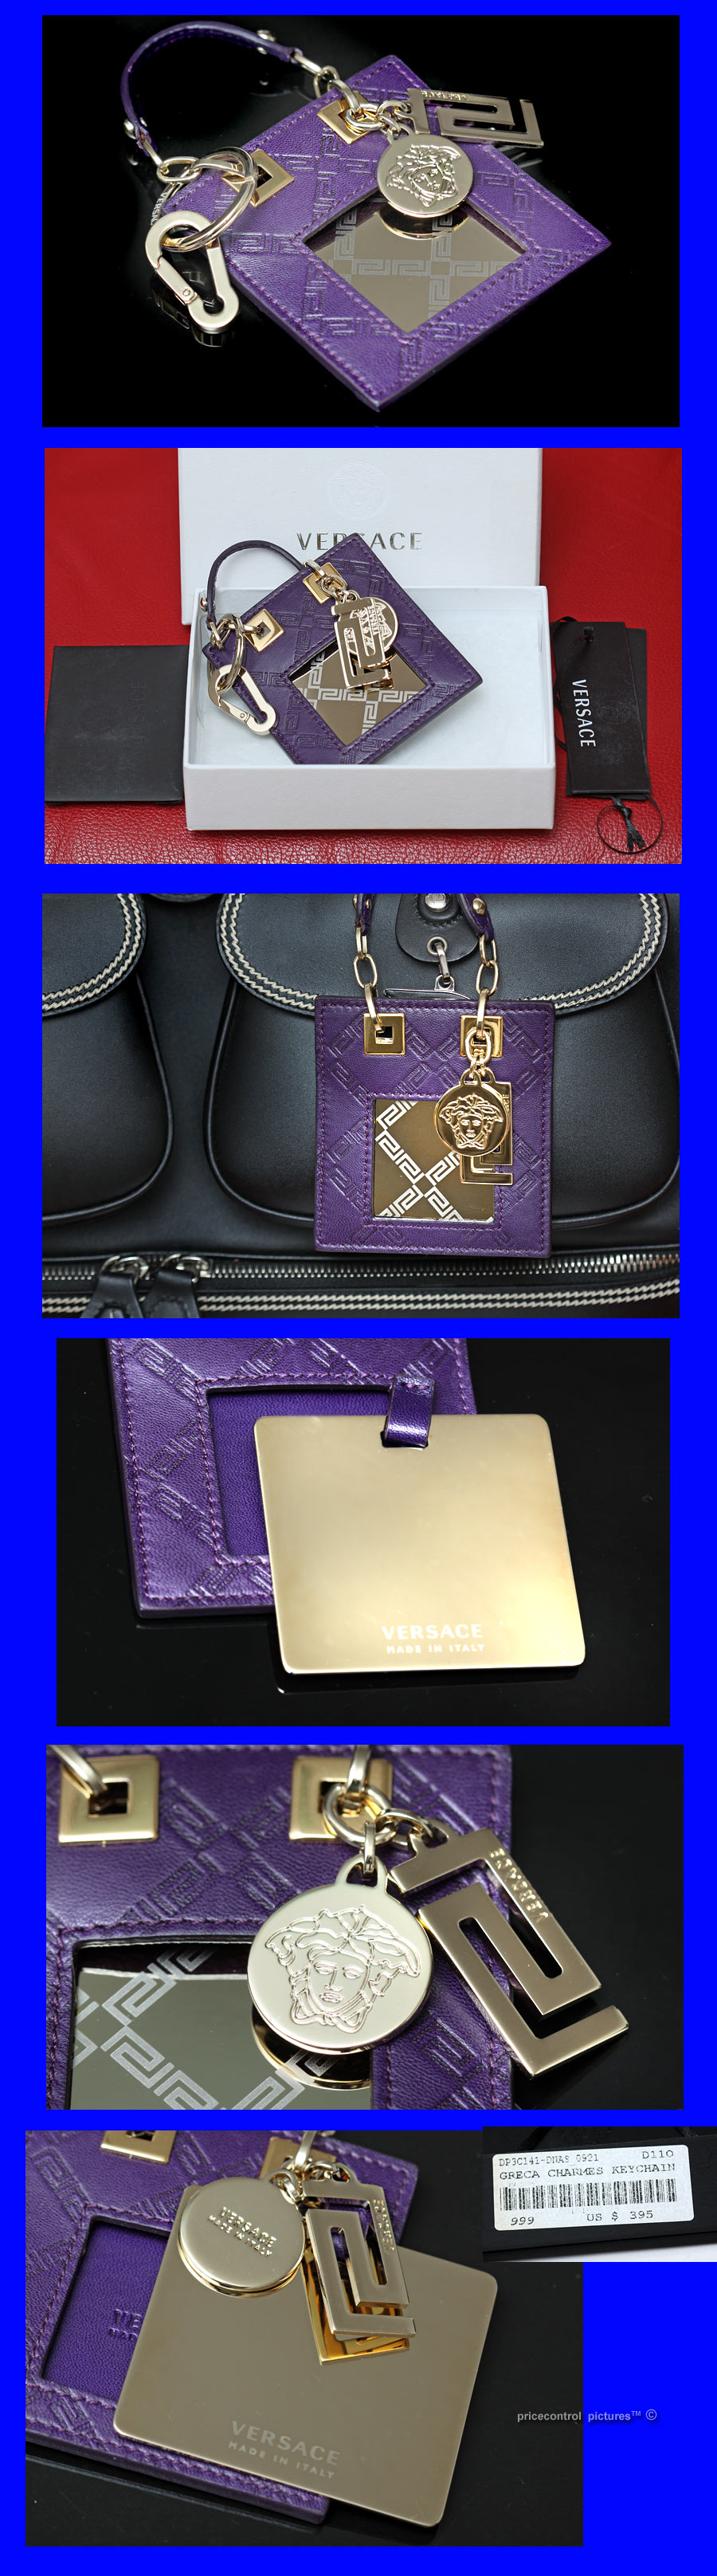 437421407131  395 VERSACE Purple MEDUSA BAG CHARM   KEY FOB